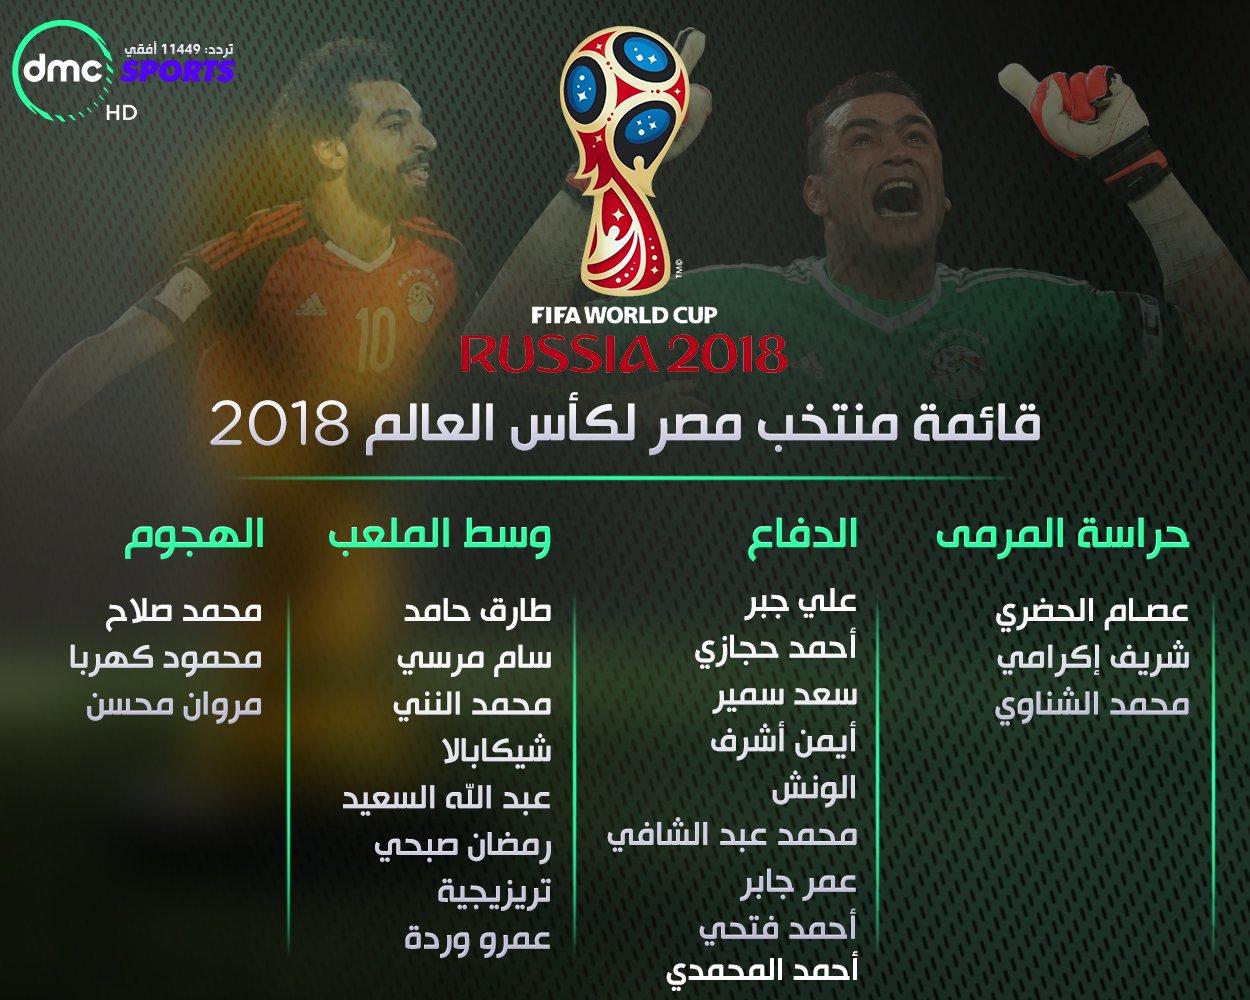 Dmc Sports On Twitter قائمة منتخب مصر لـ كأس العالم روسيا